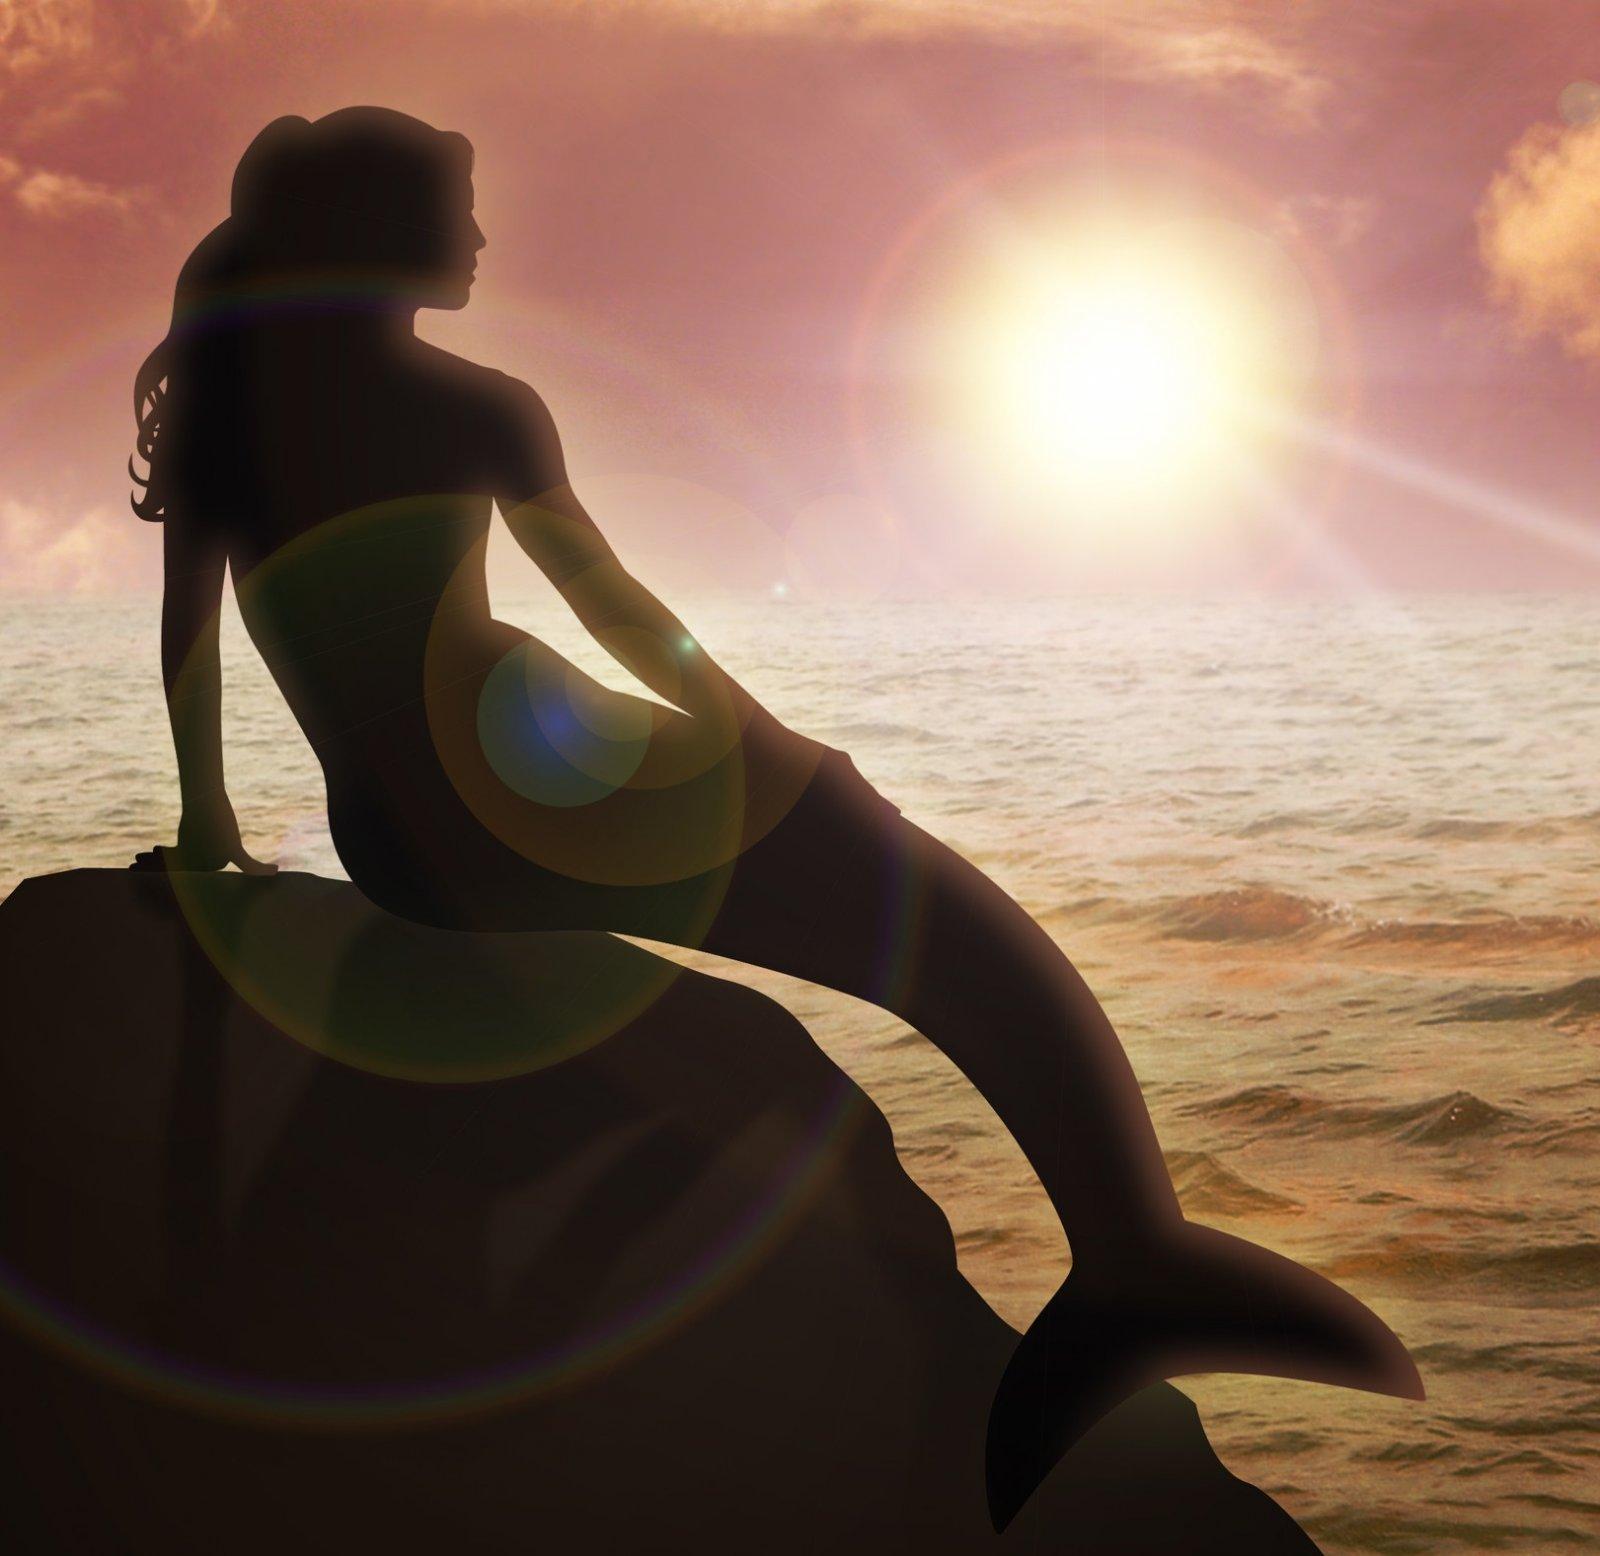 Mermaid-Silouhette-on-Rock-Ocean.jpg